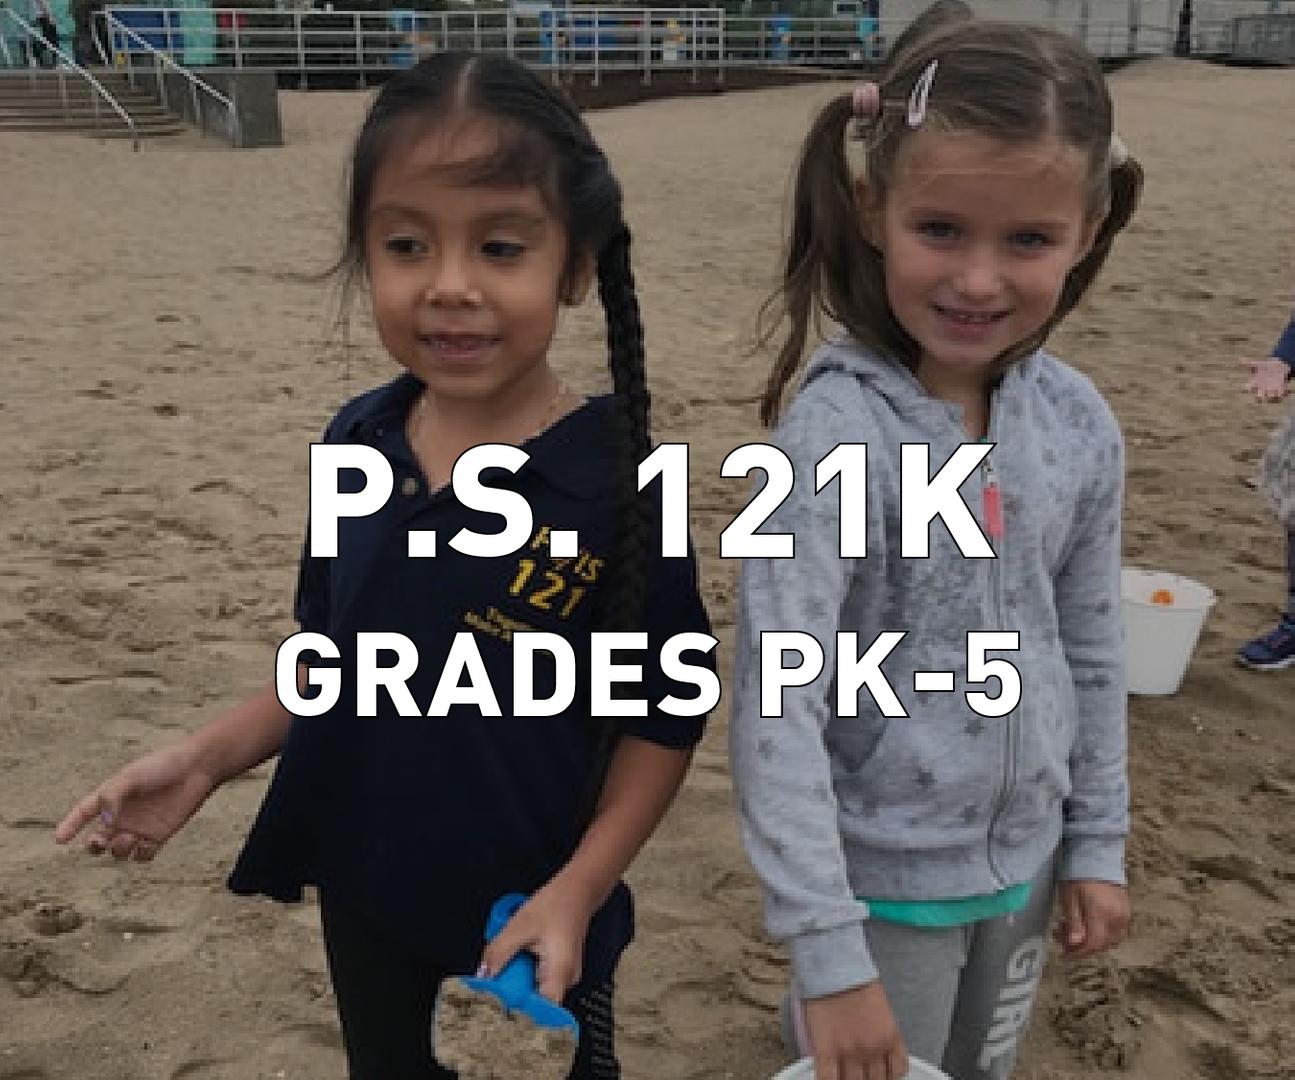 P.S. 121K Grades PK-5